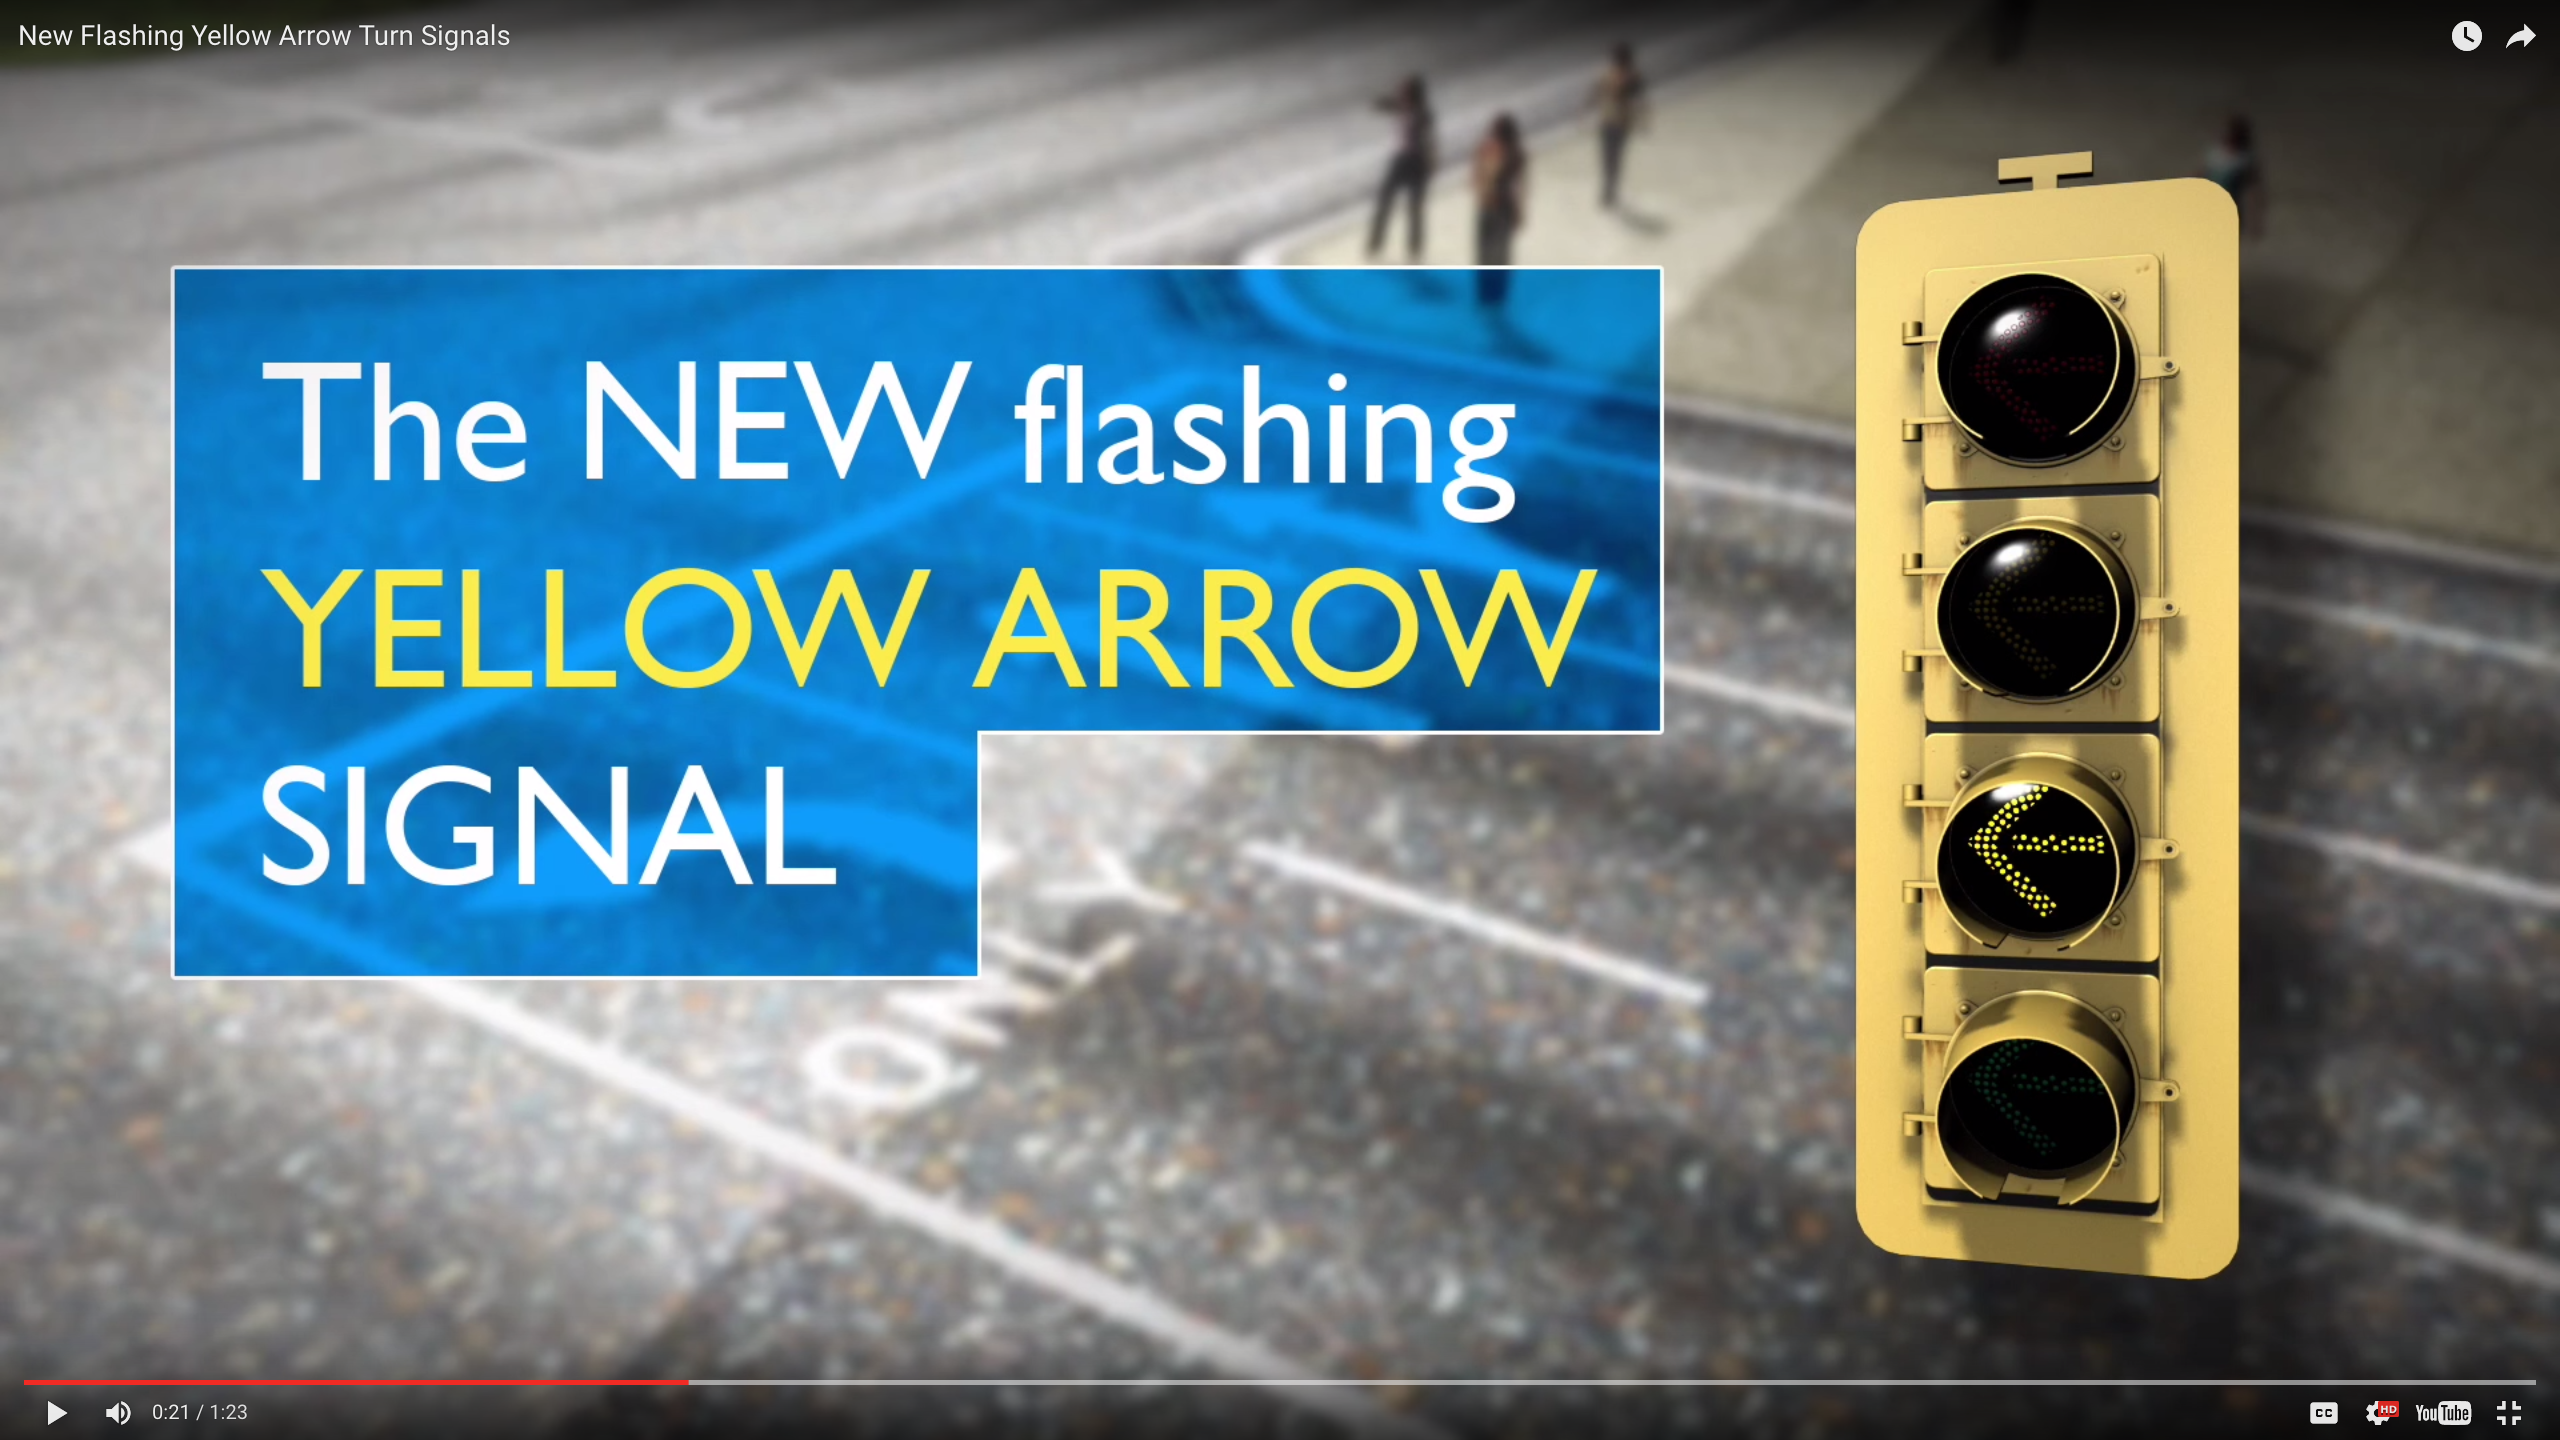 Flashing Yellow Arrow Turn Signals